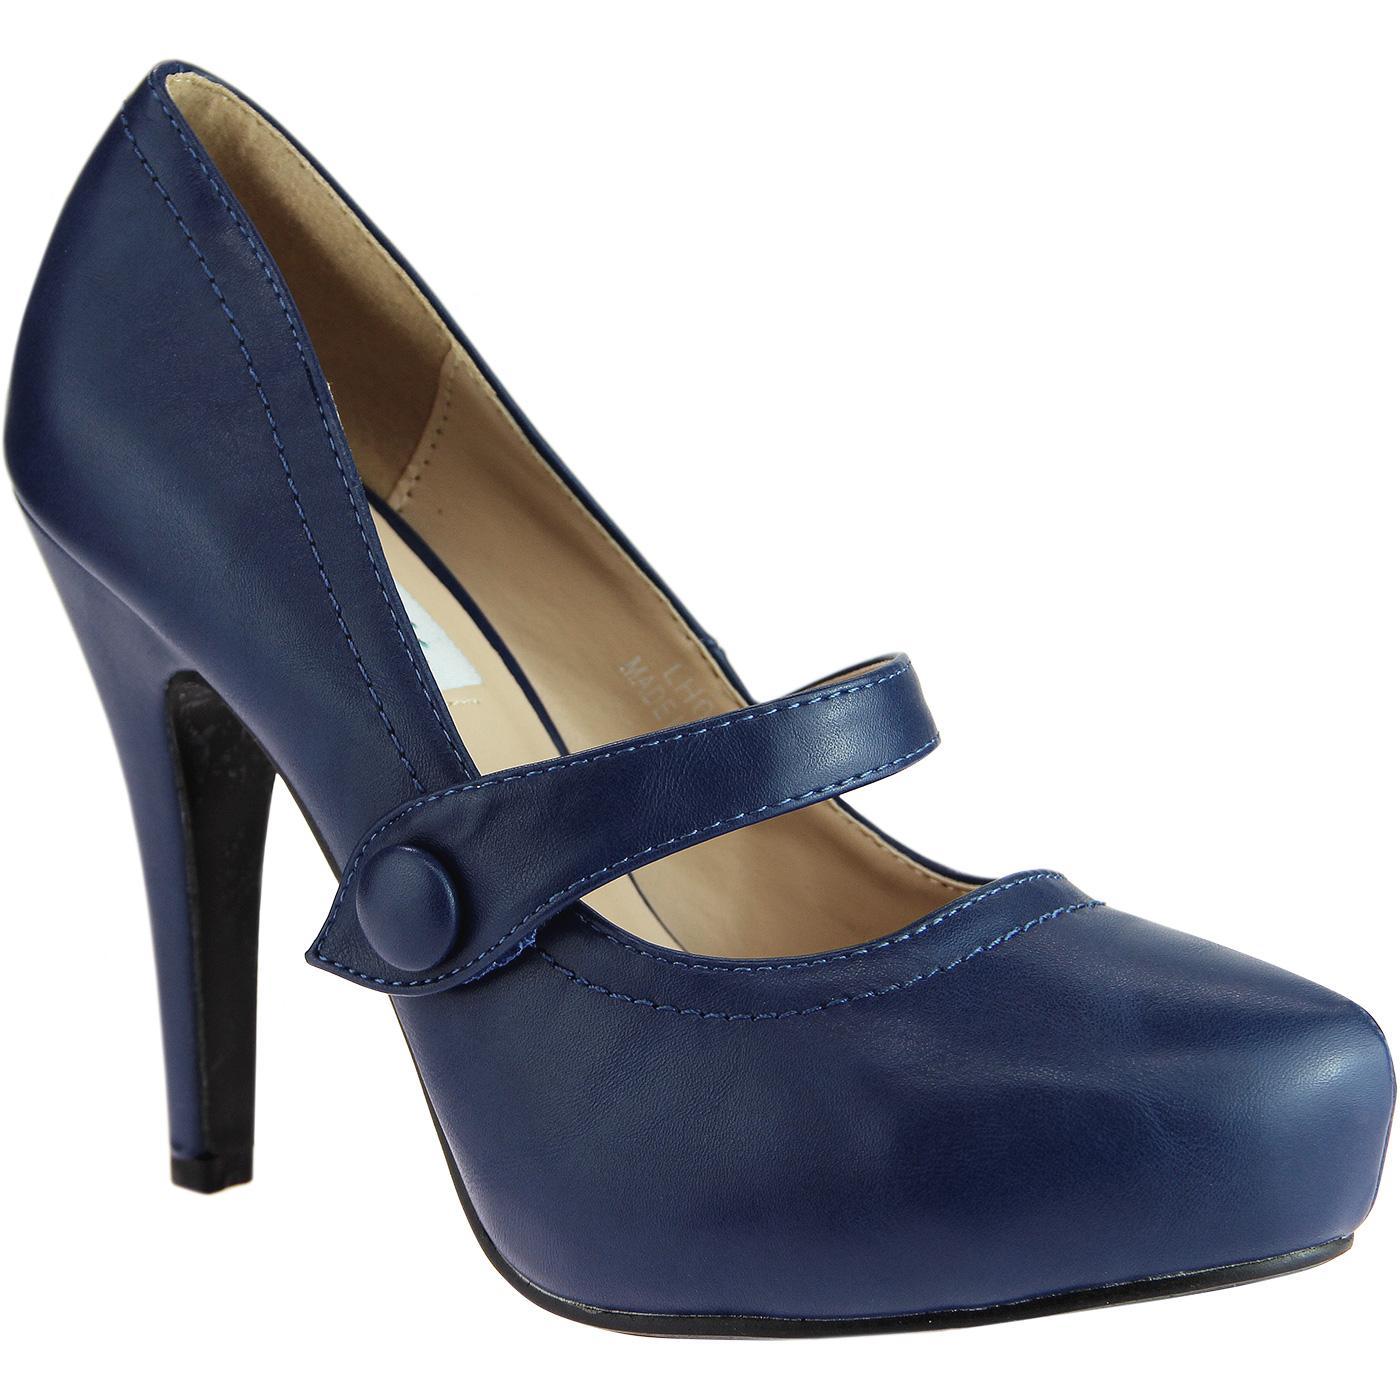 Dolly LULU HUN Retro 50s Vintage High Heel Shoes